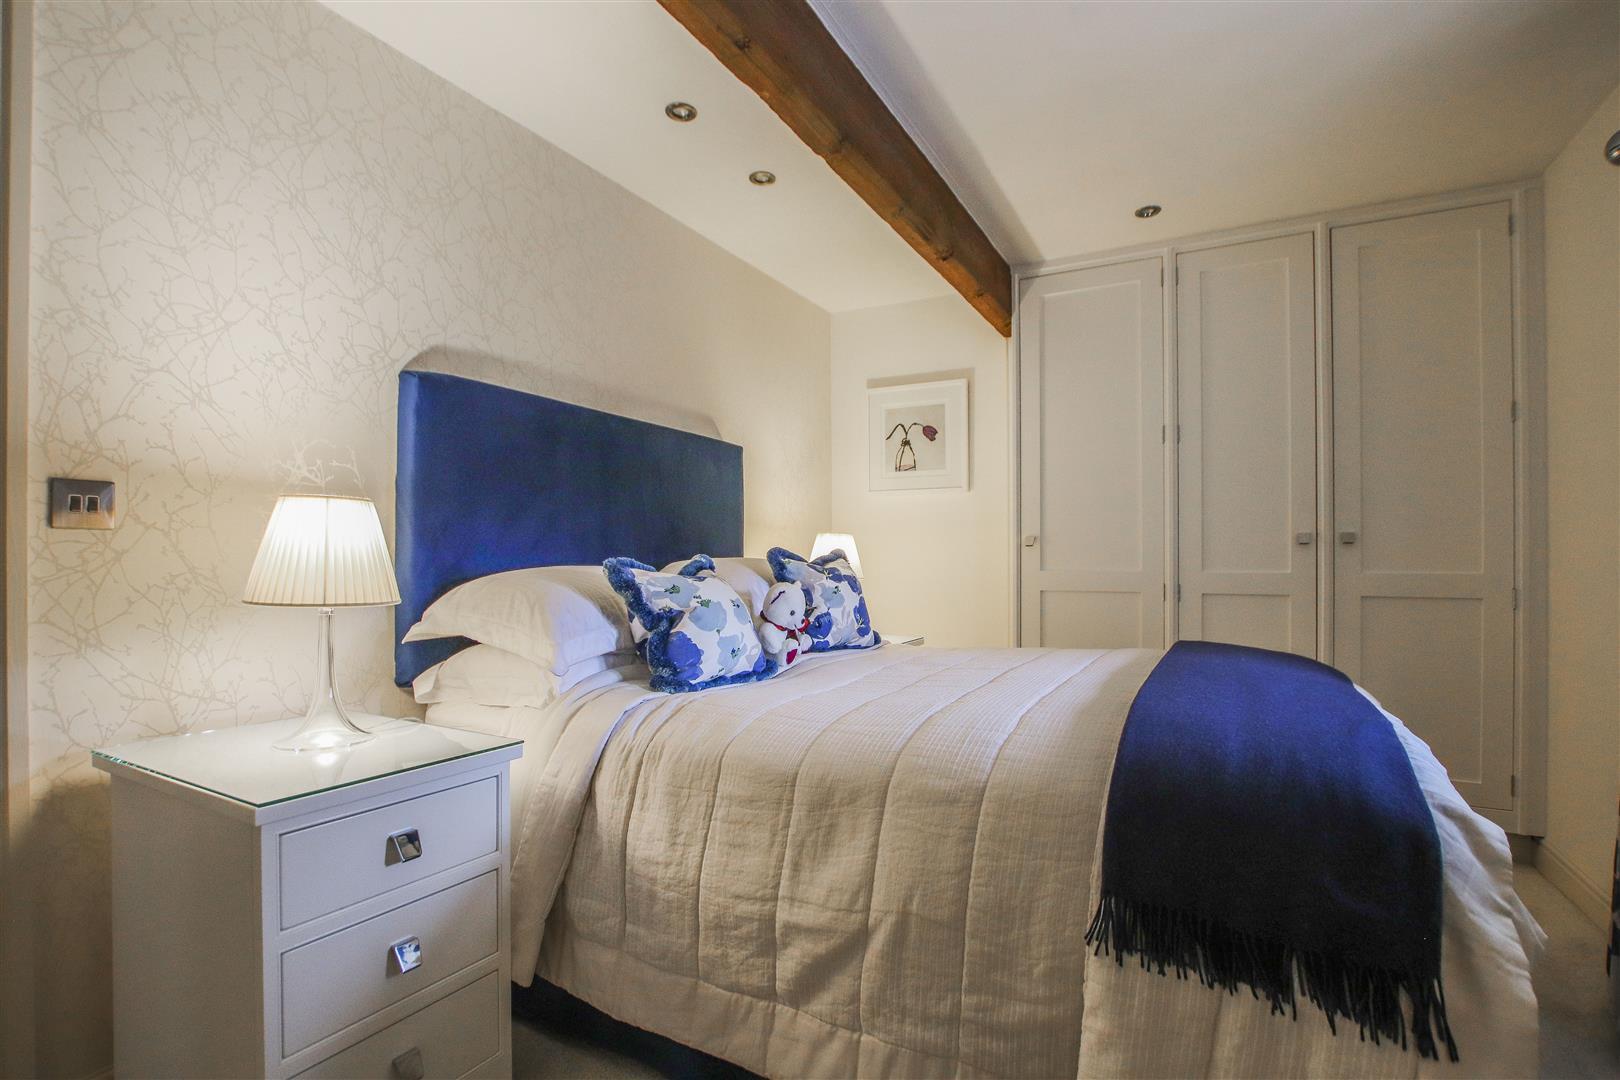 5 Bedroom Semi-detached House For Sale - 56.JPG